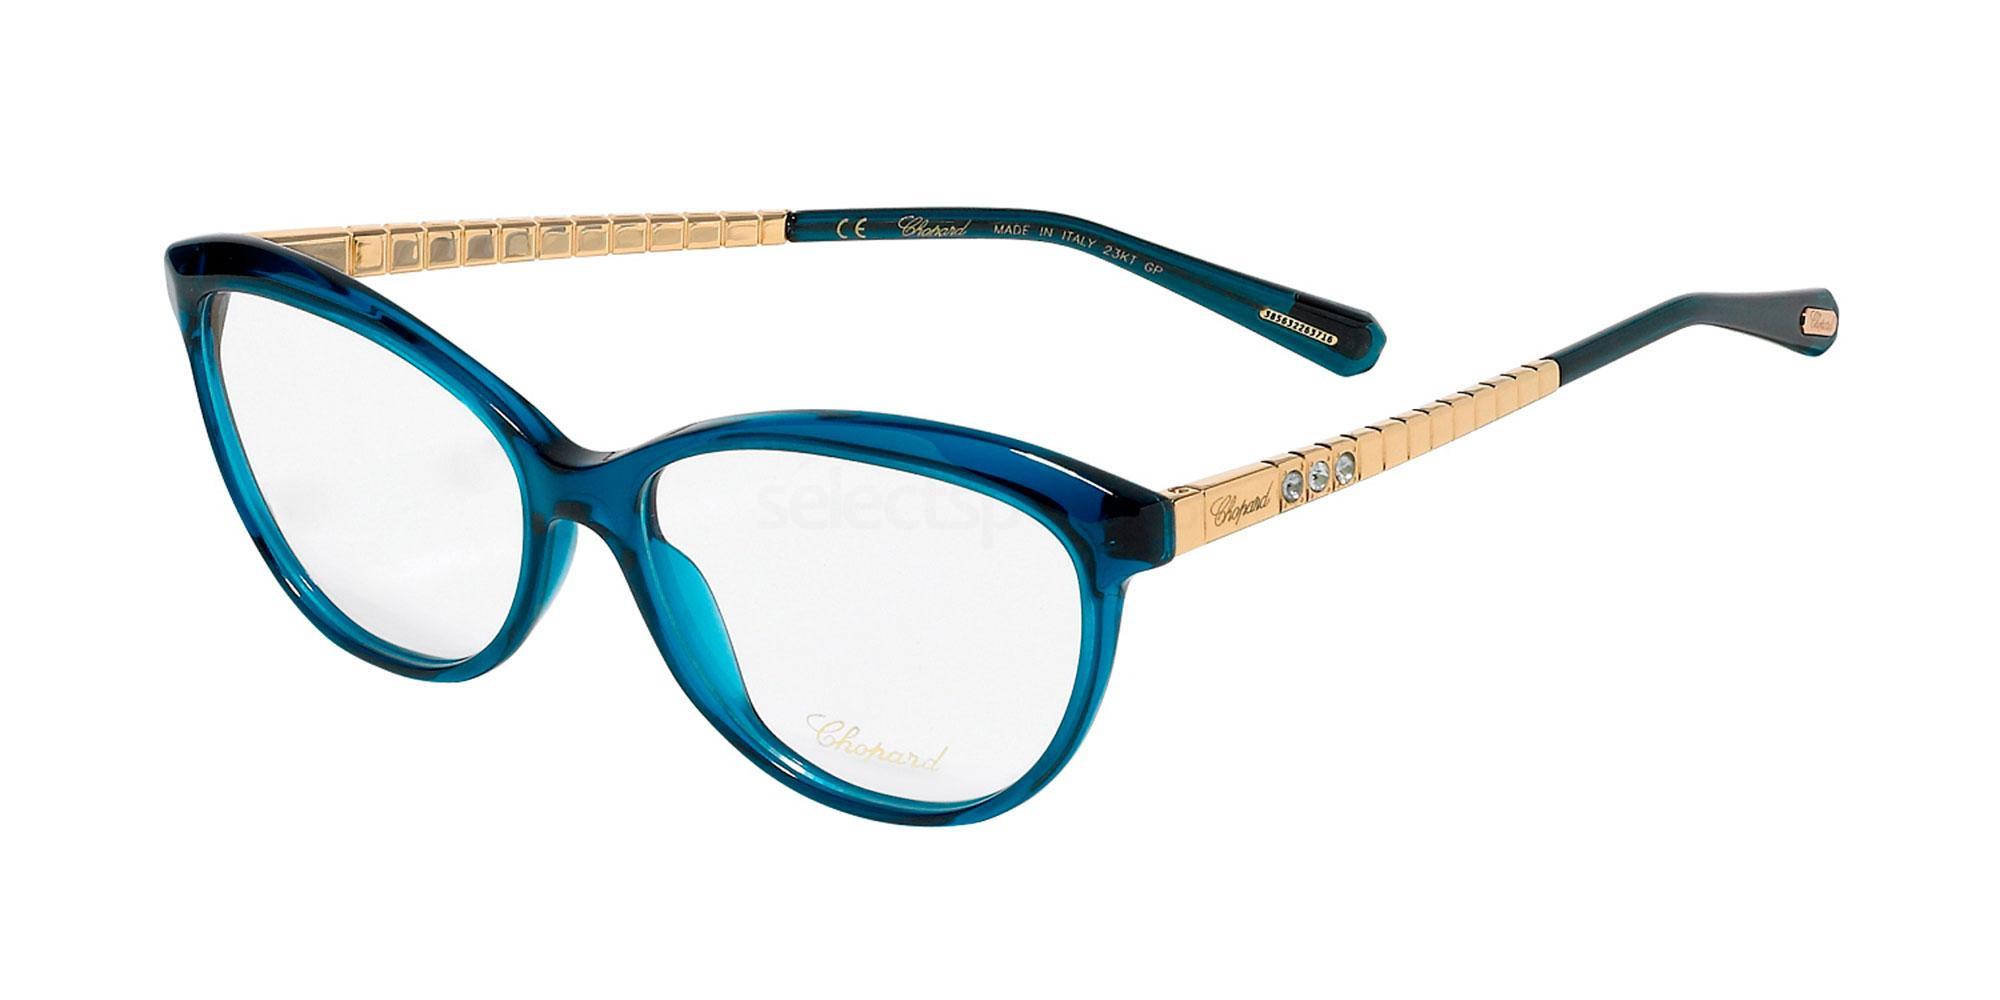 06TJ VCH242S Glasses, Chopard